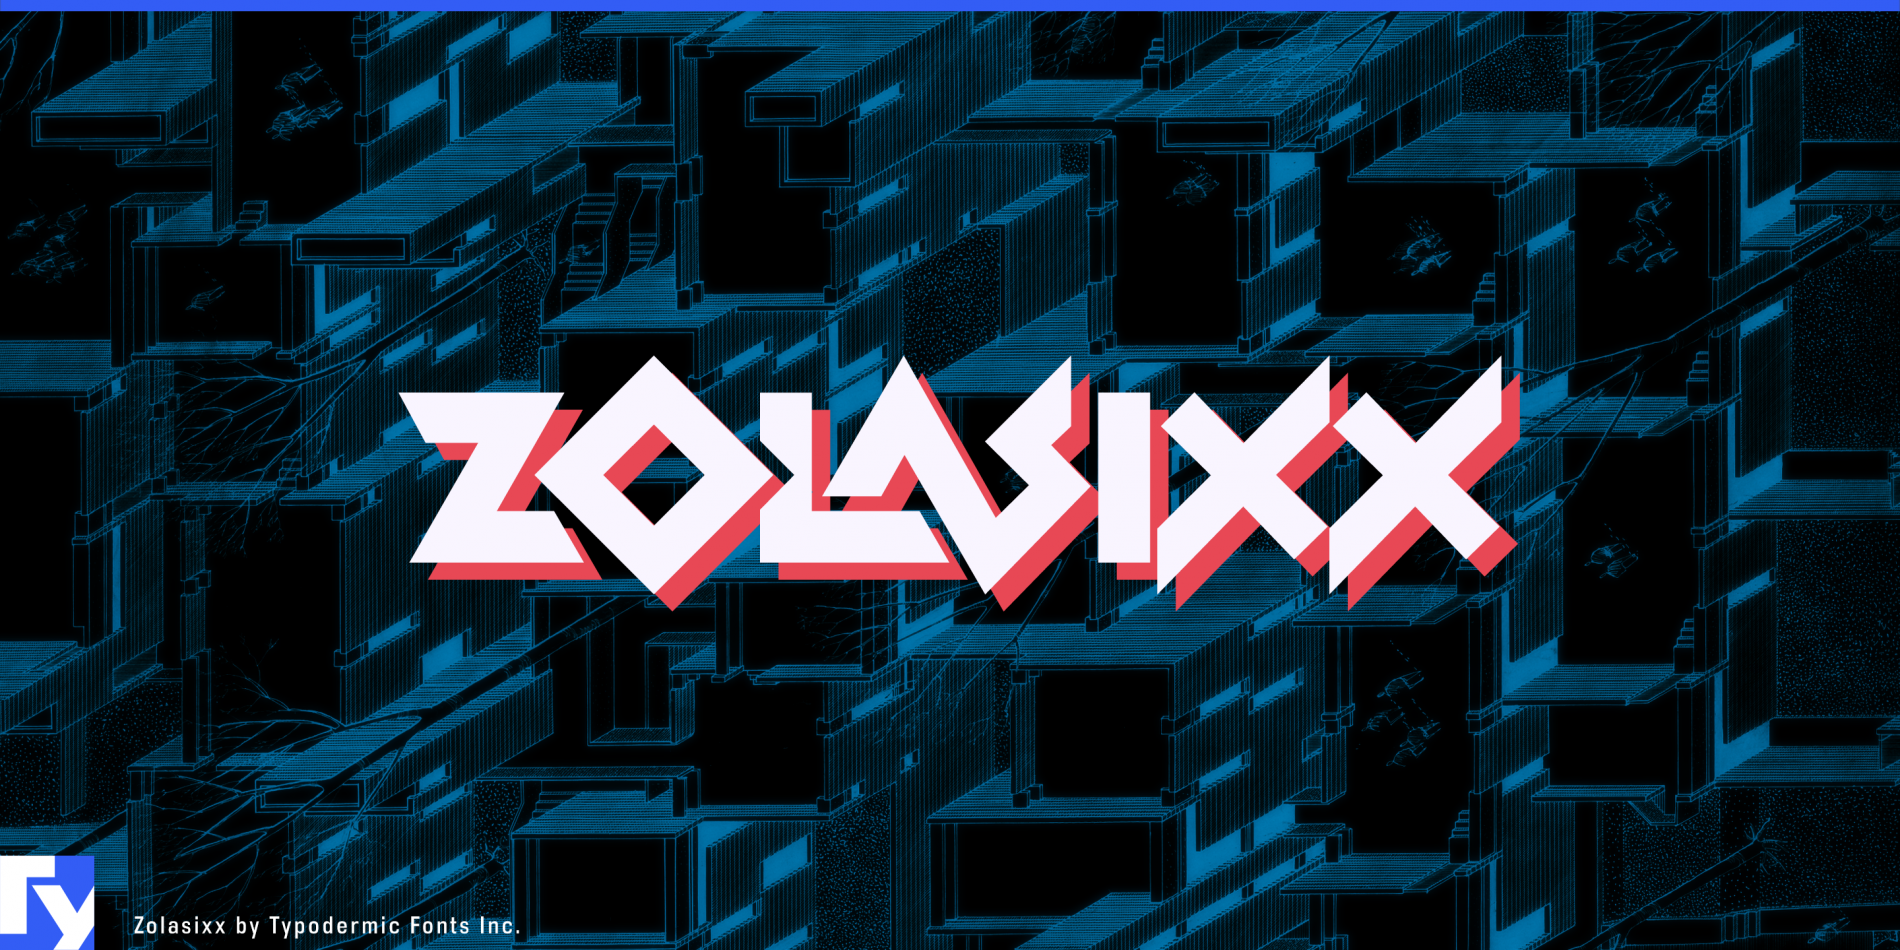 Zolasixx